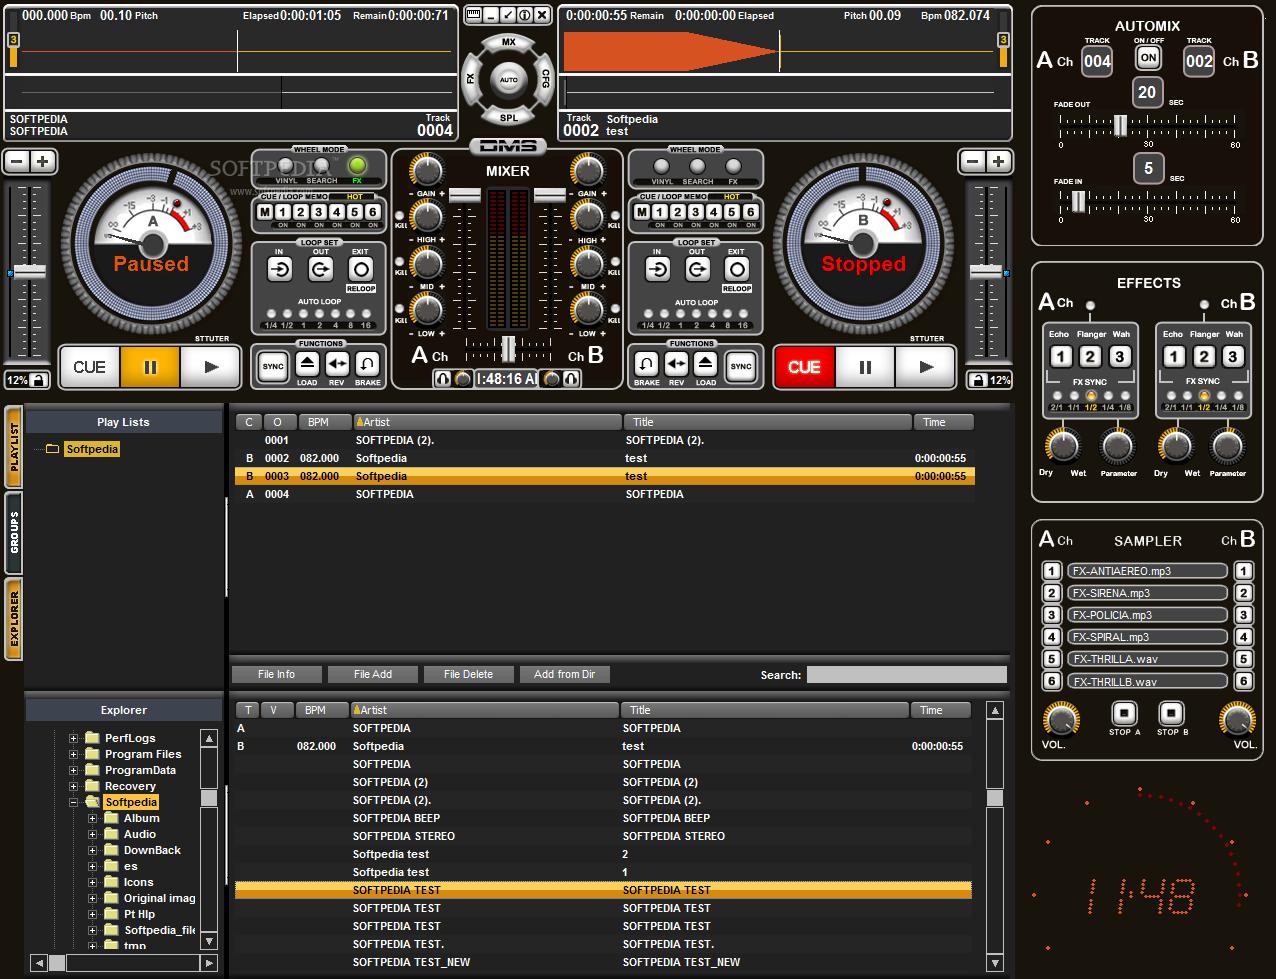 dj mixer software free download full version for windows 7